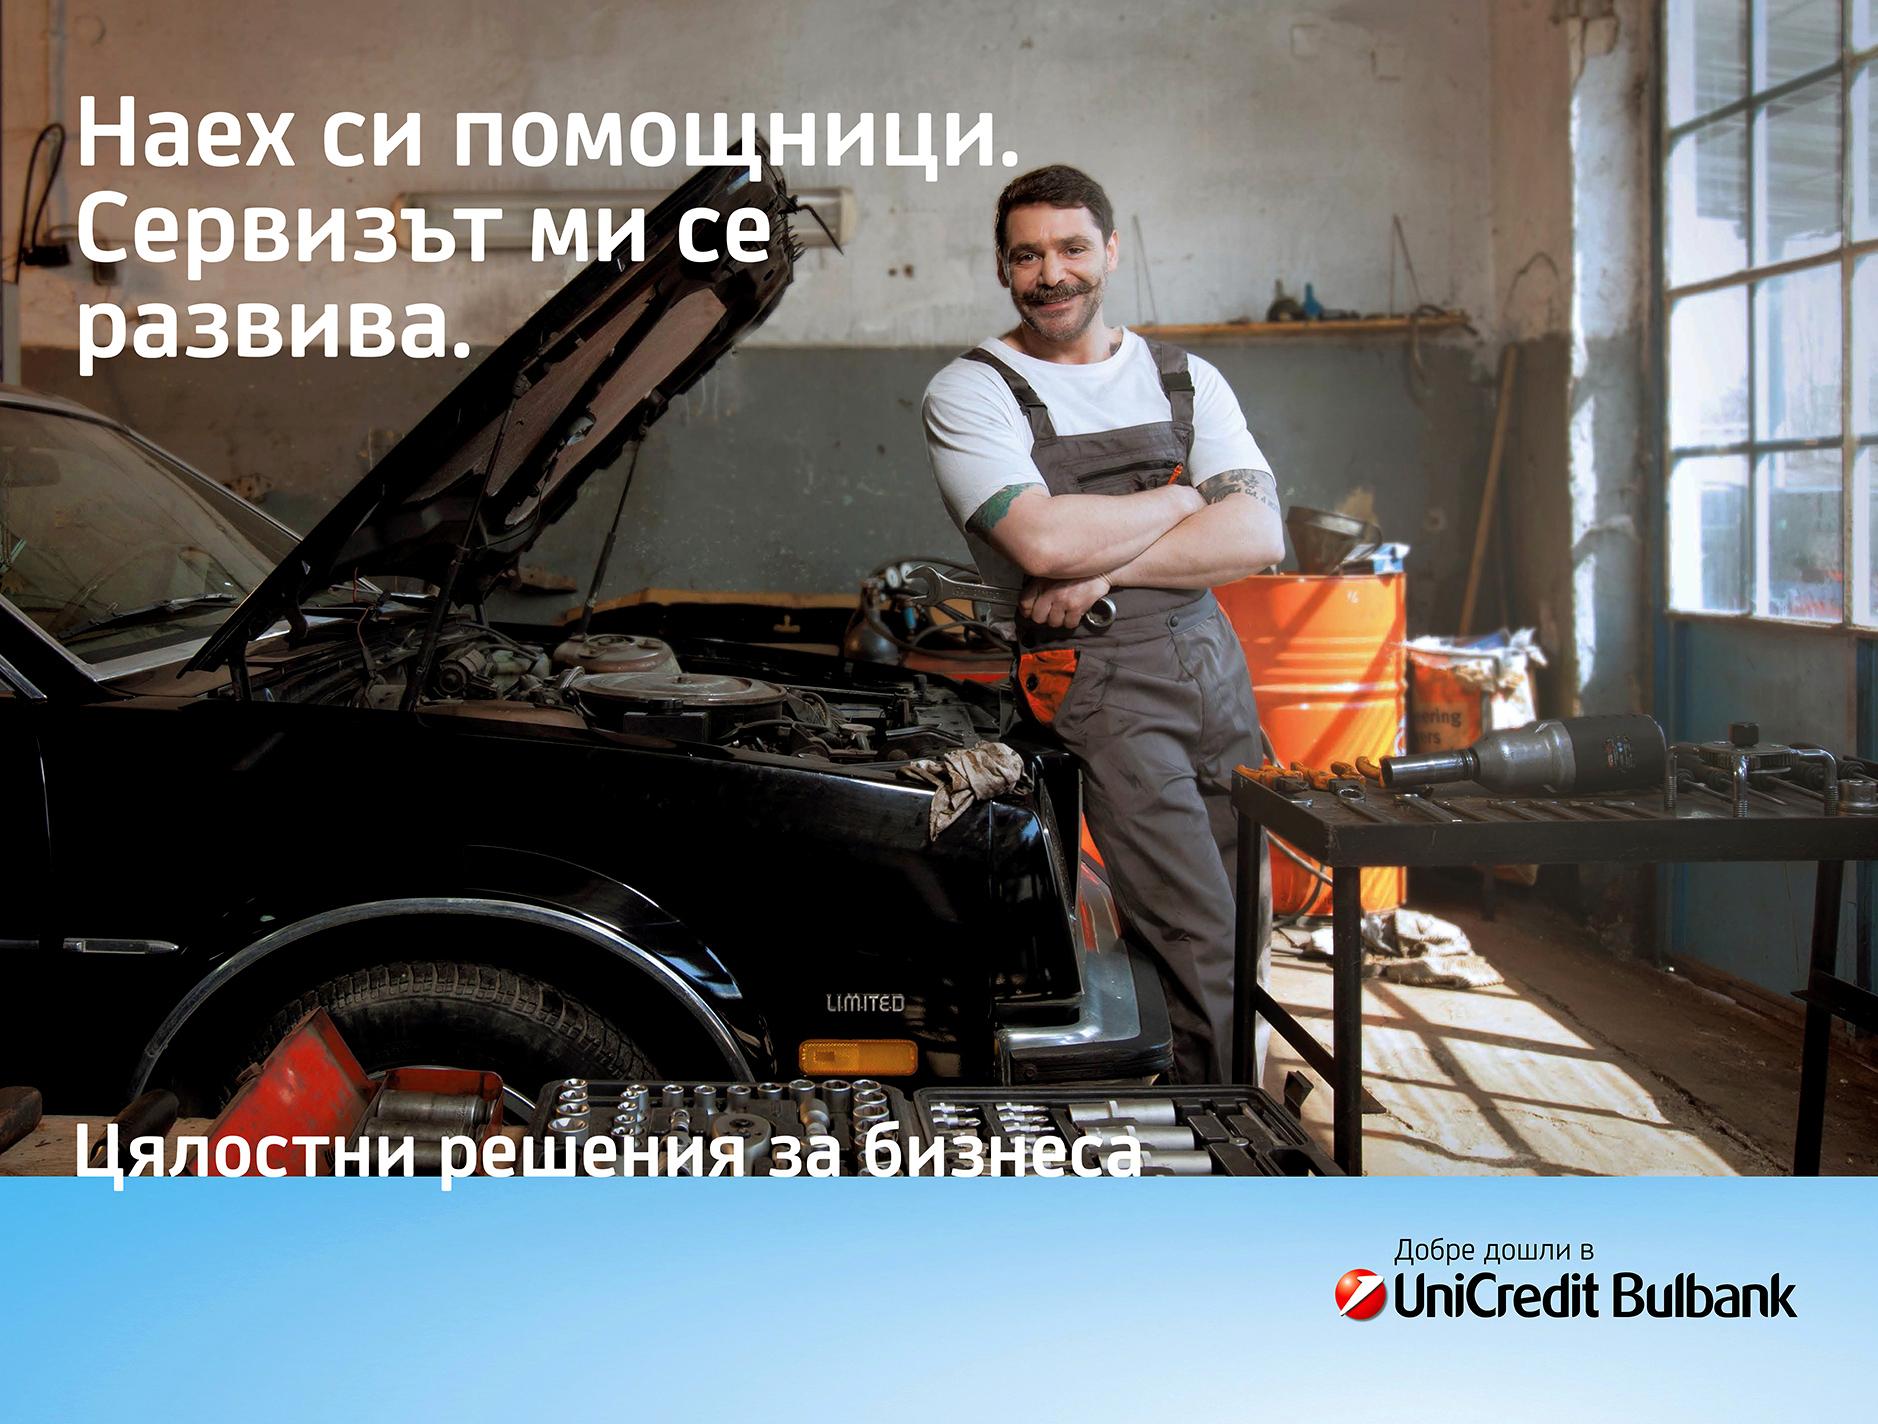 UCB_SME_OOH_carMechanic